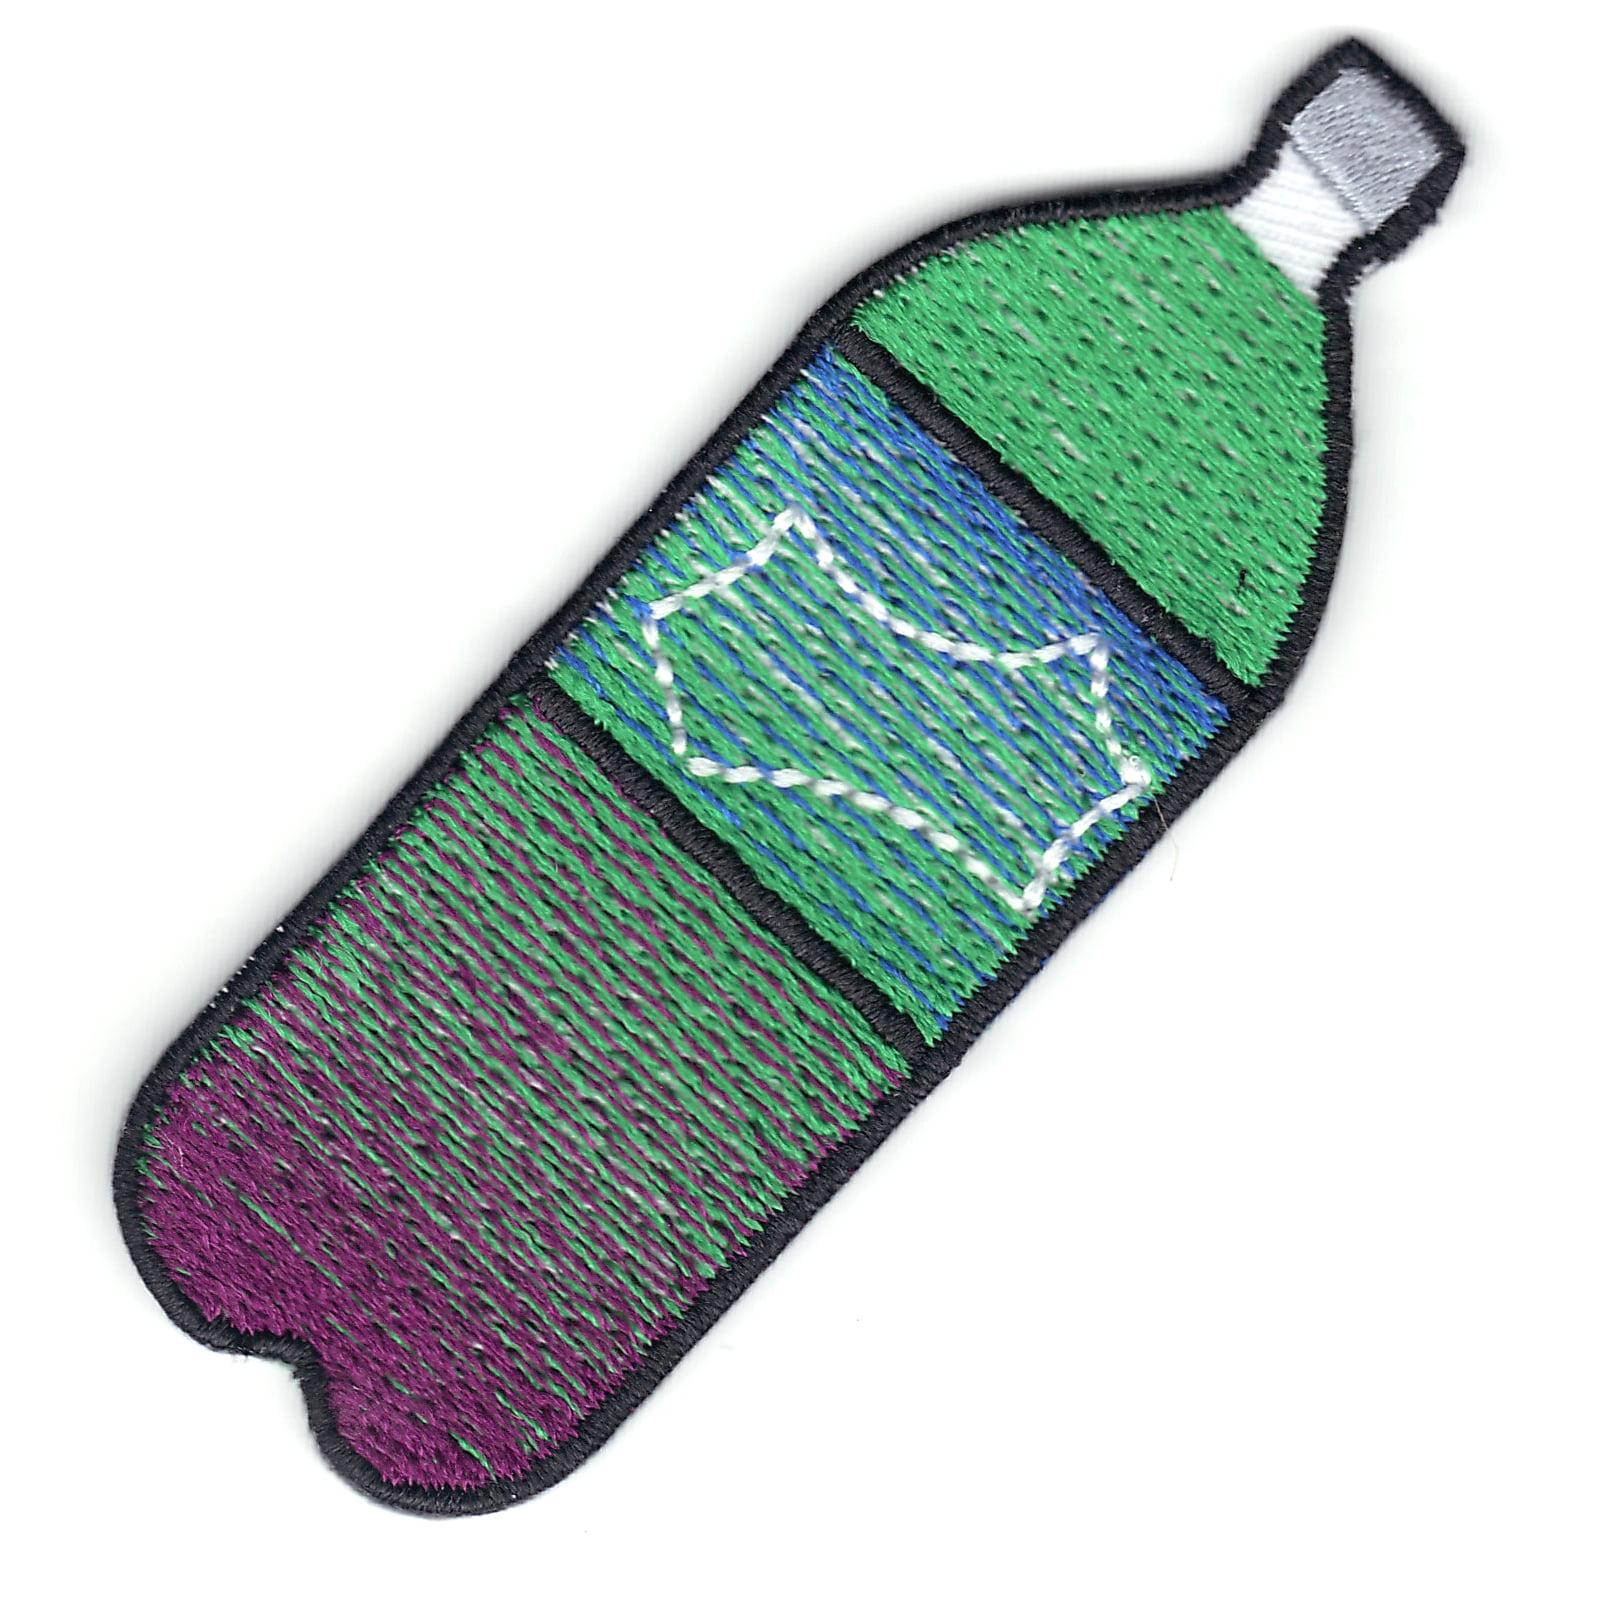 Purple Drank Syrup 2 Liter Soda Bottle Emoji Iron On Patch